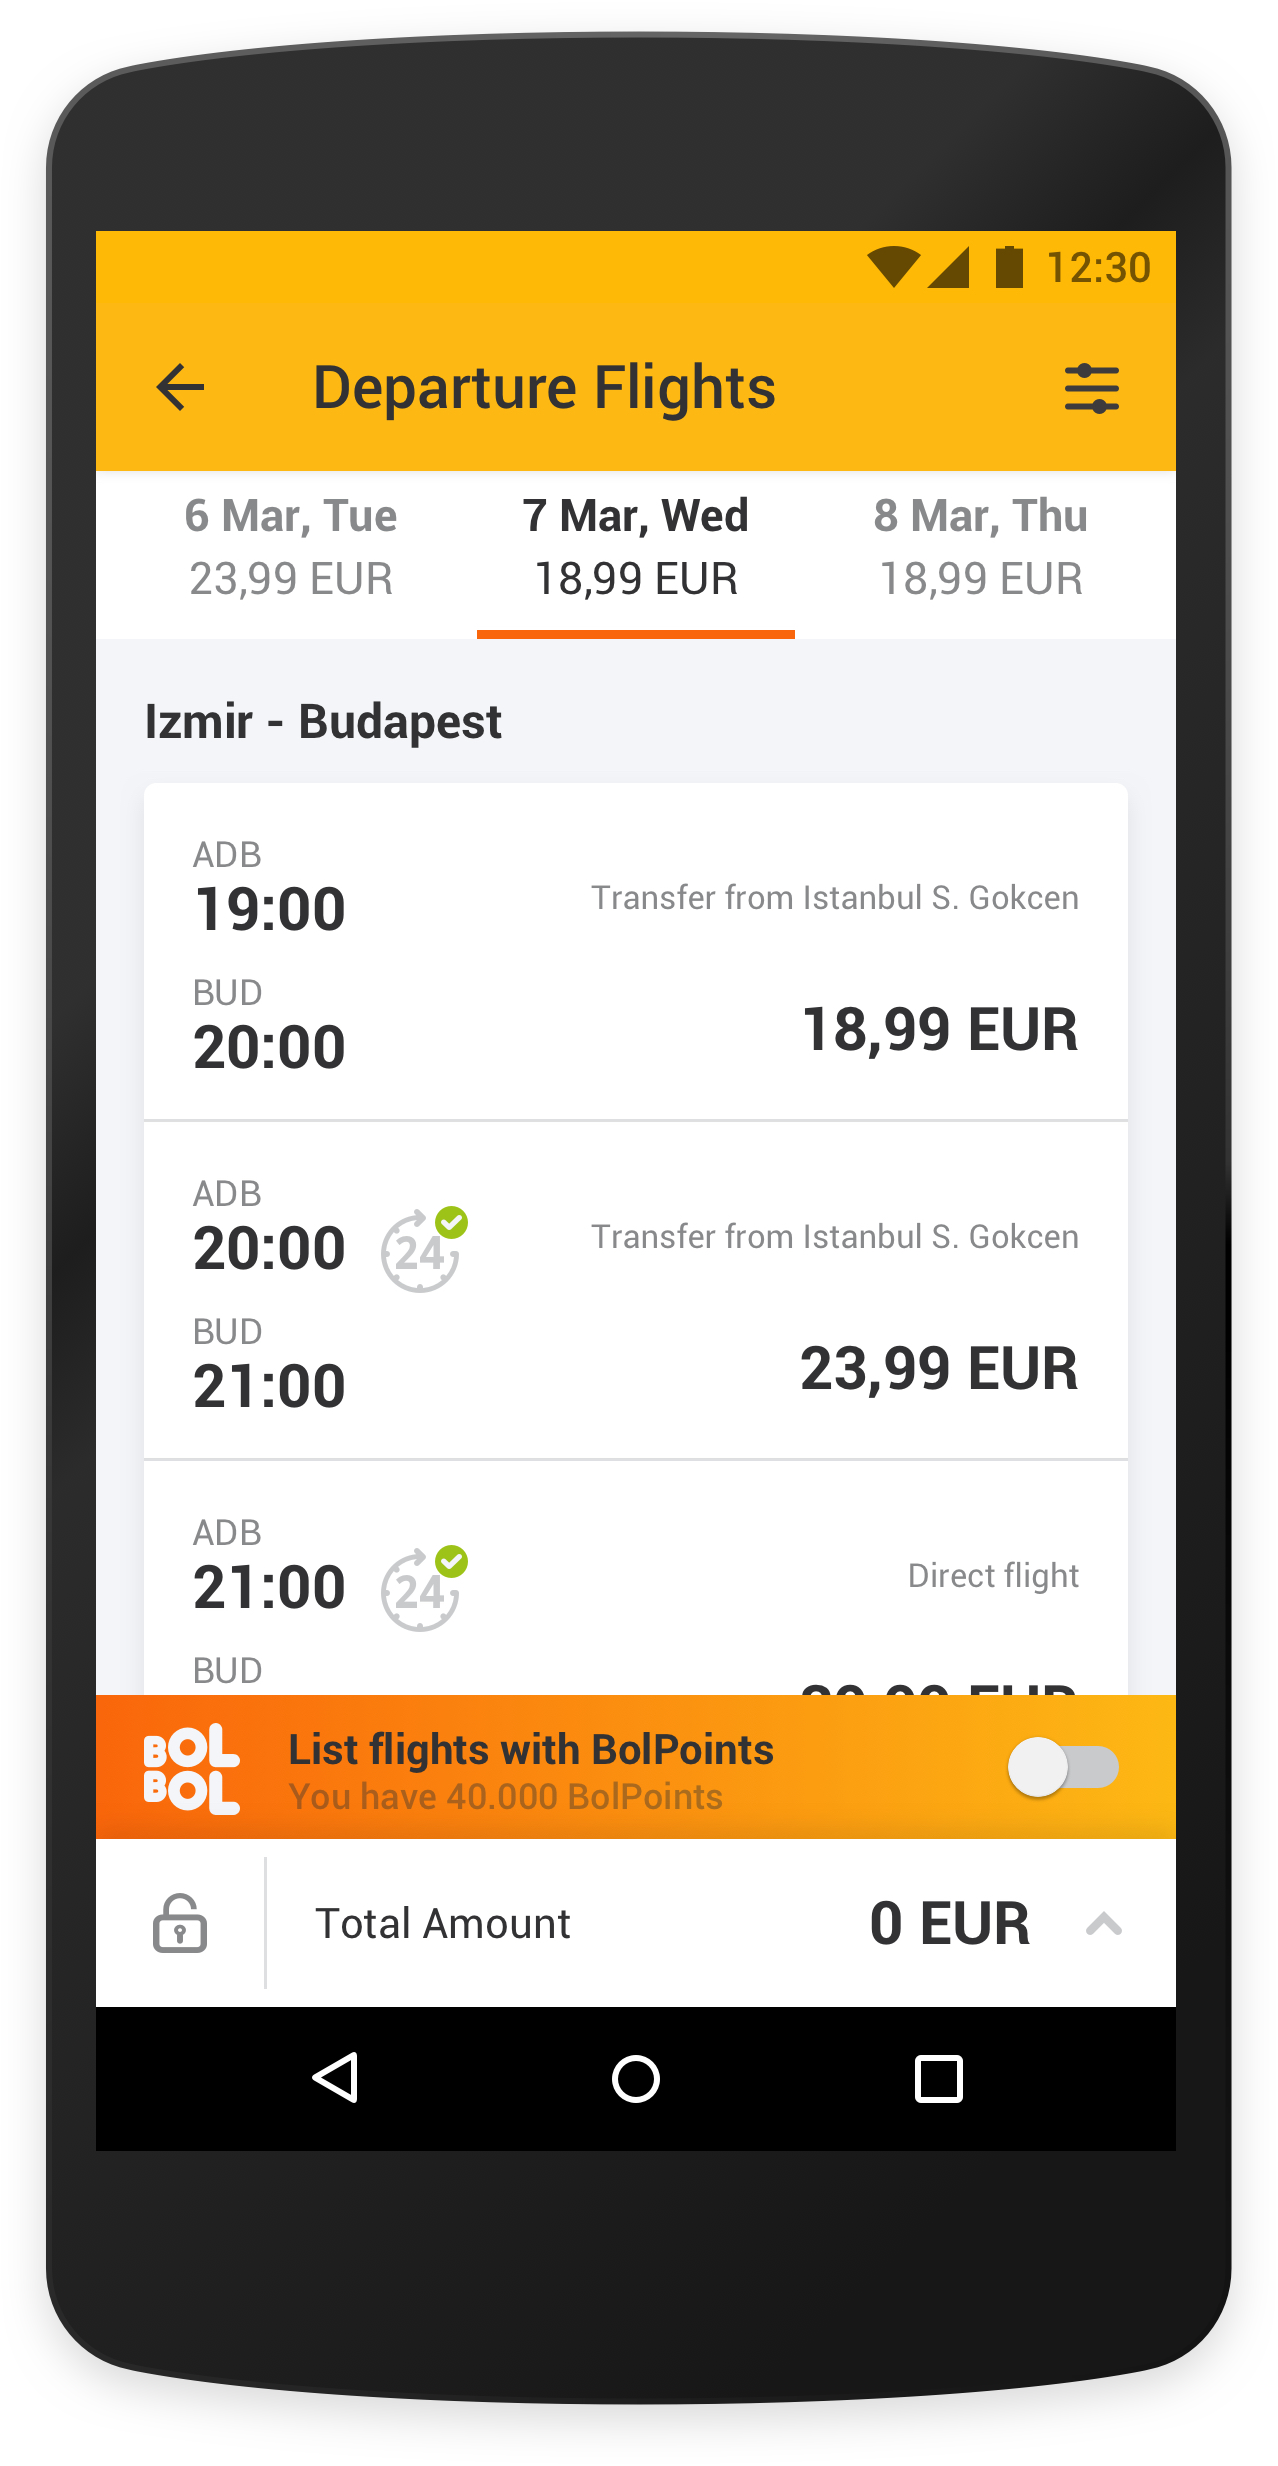 pegasus mobile application